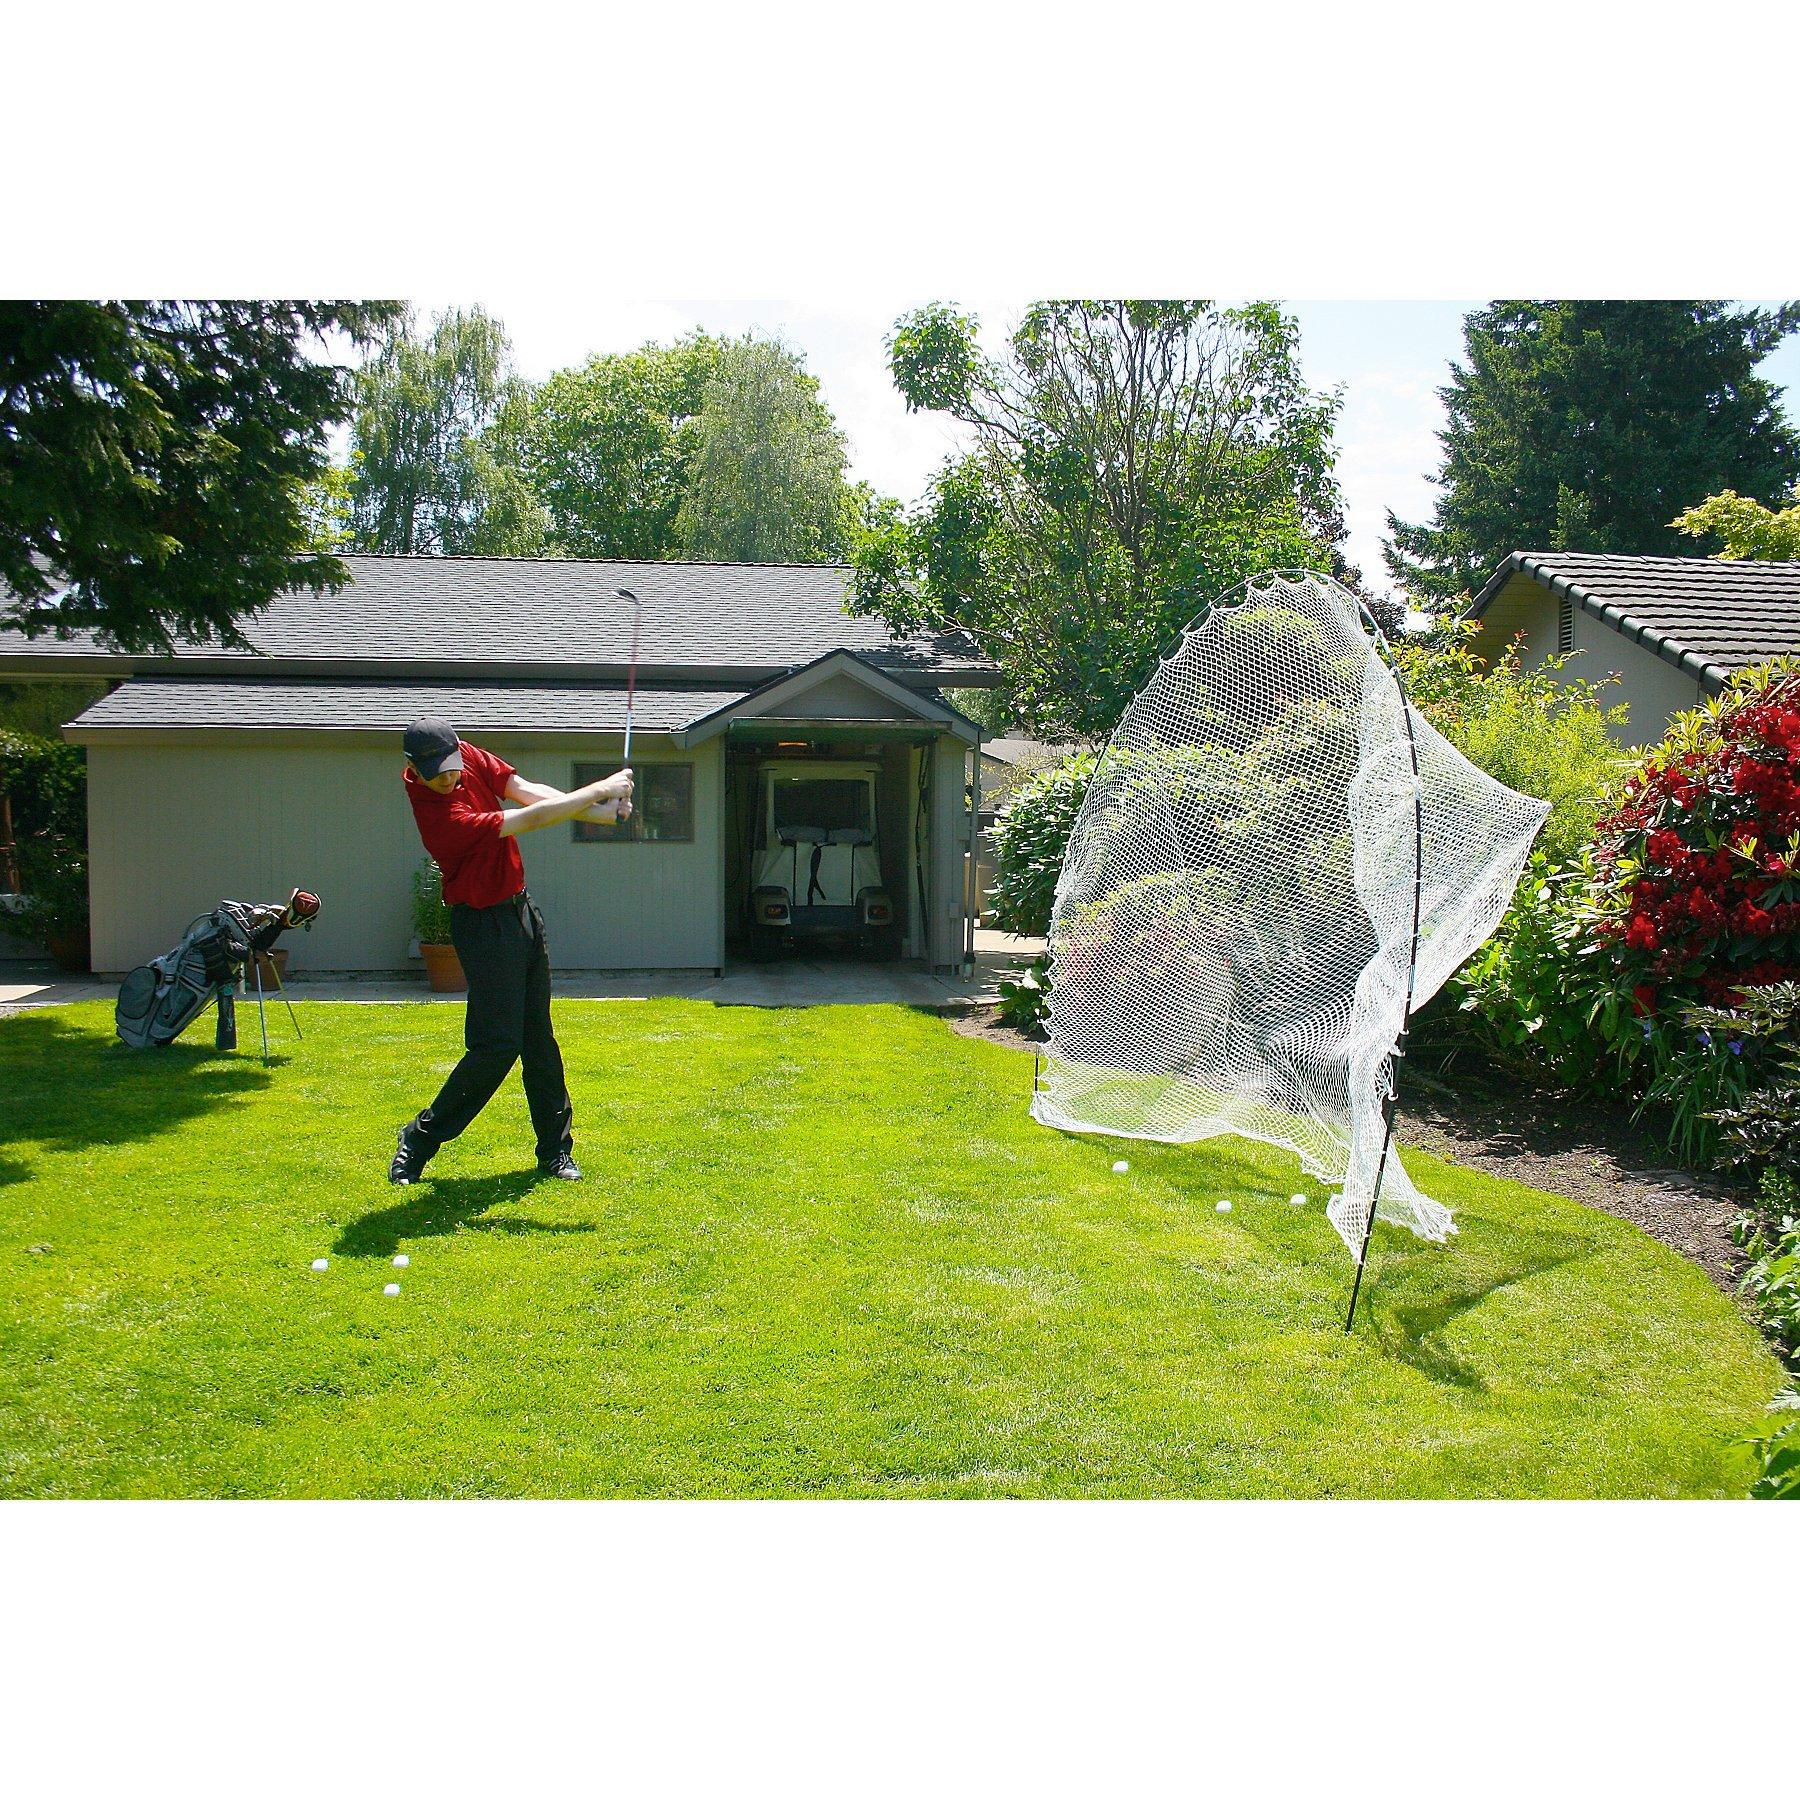 Go Net Backyard Golf Practice Hitting Net by ProActive Sports (Image #3)